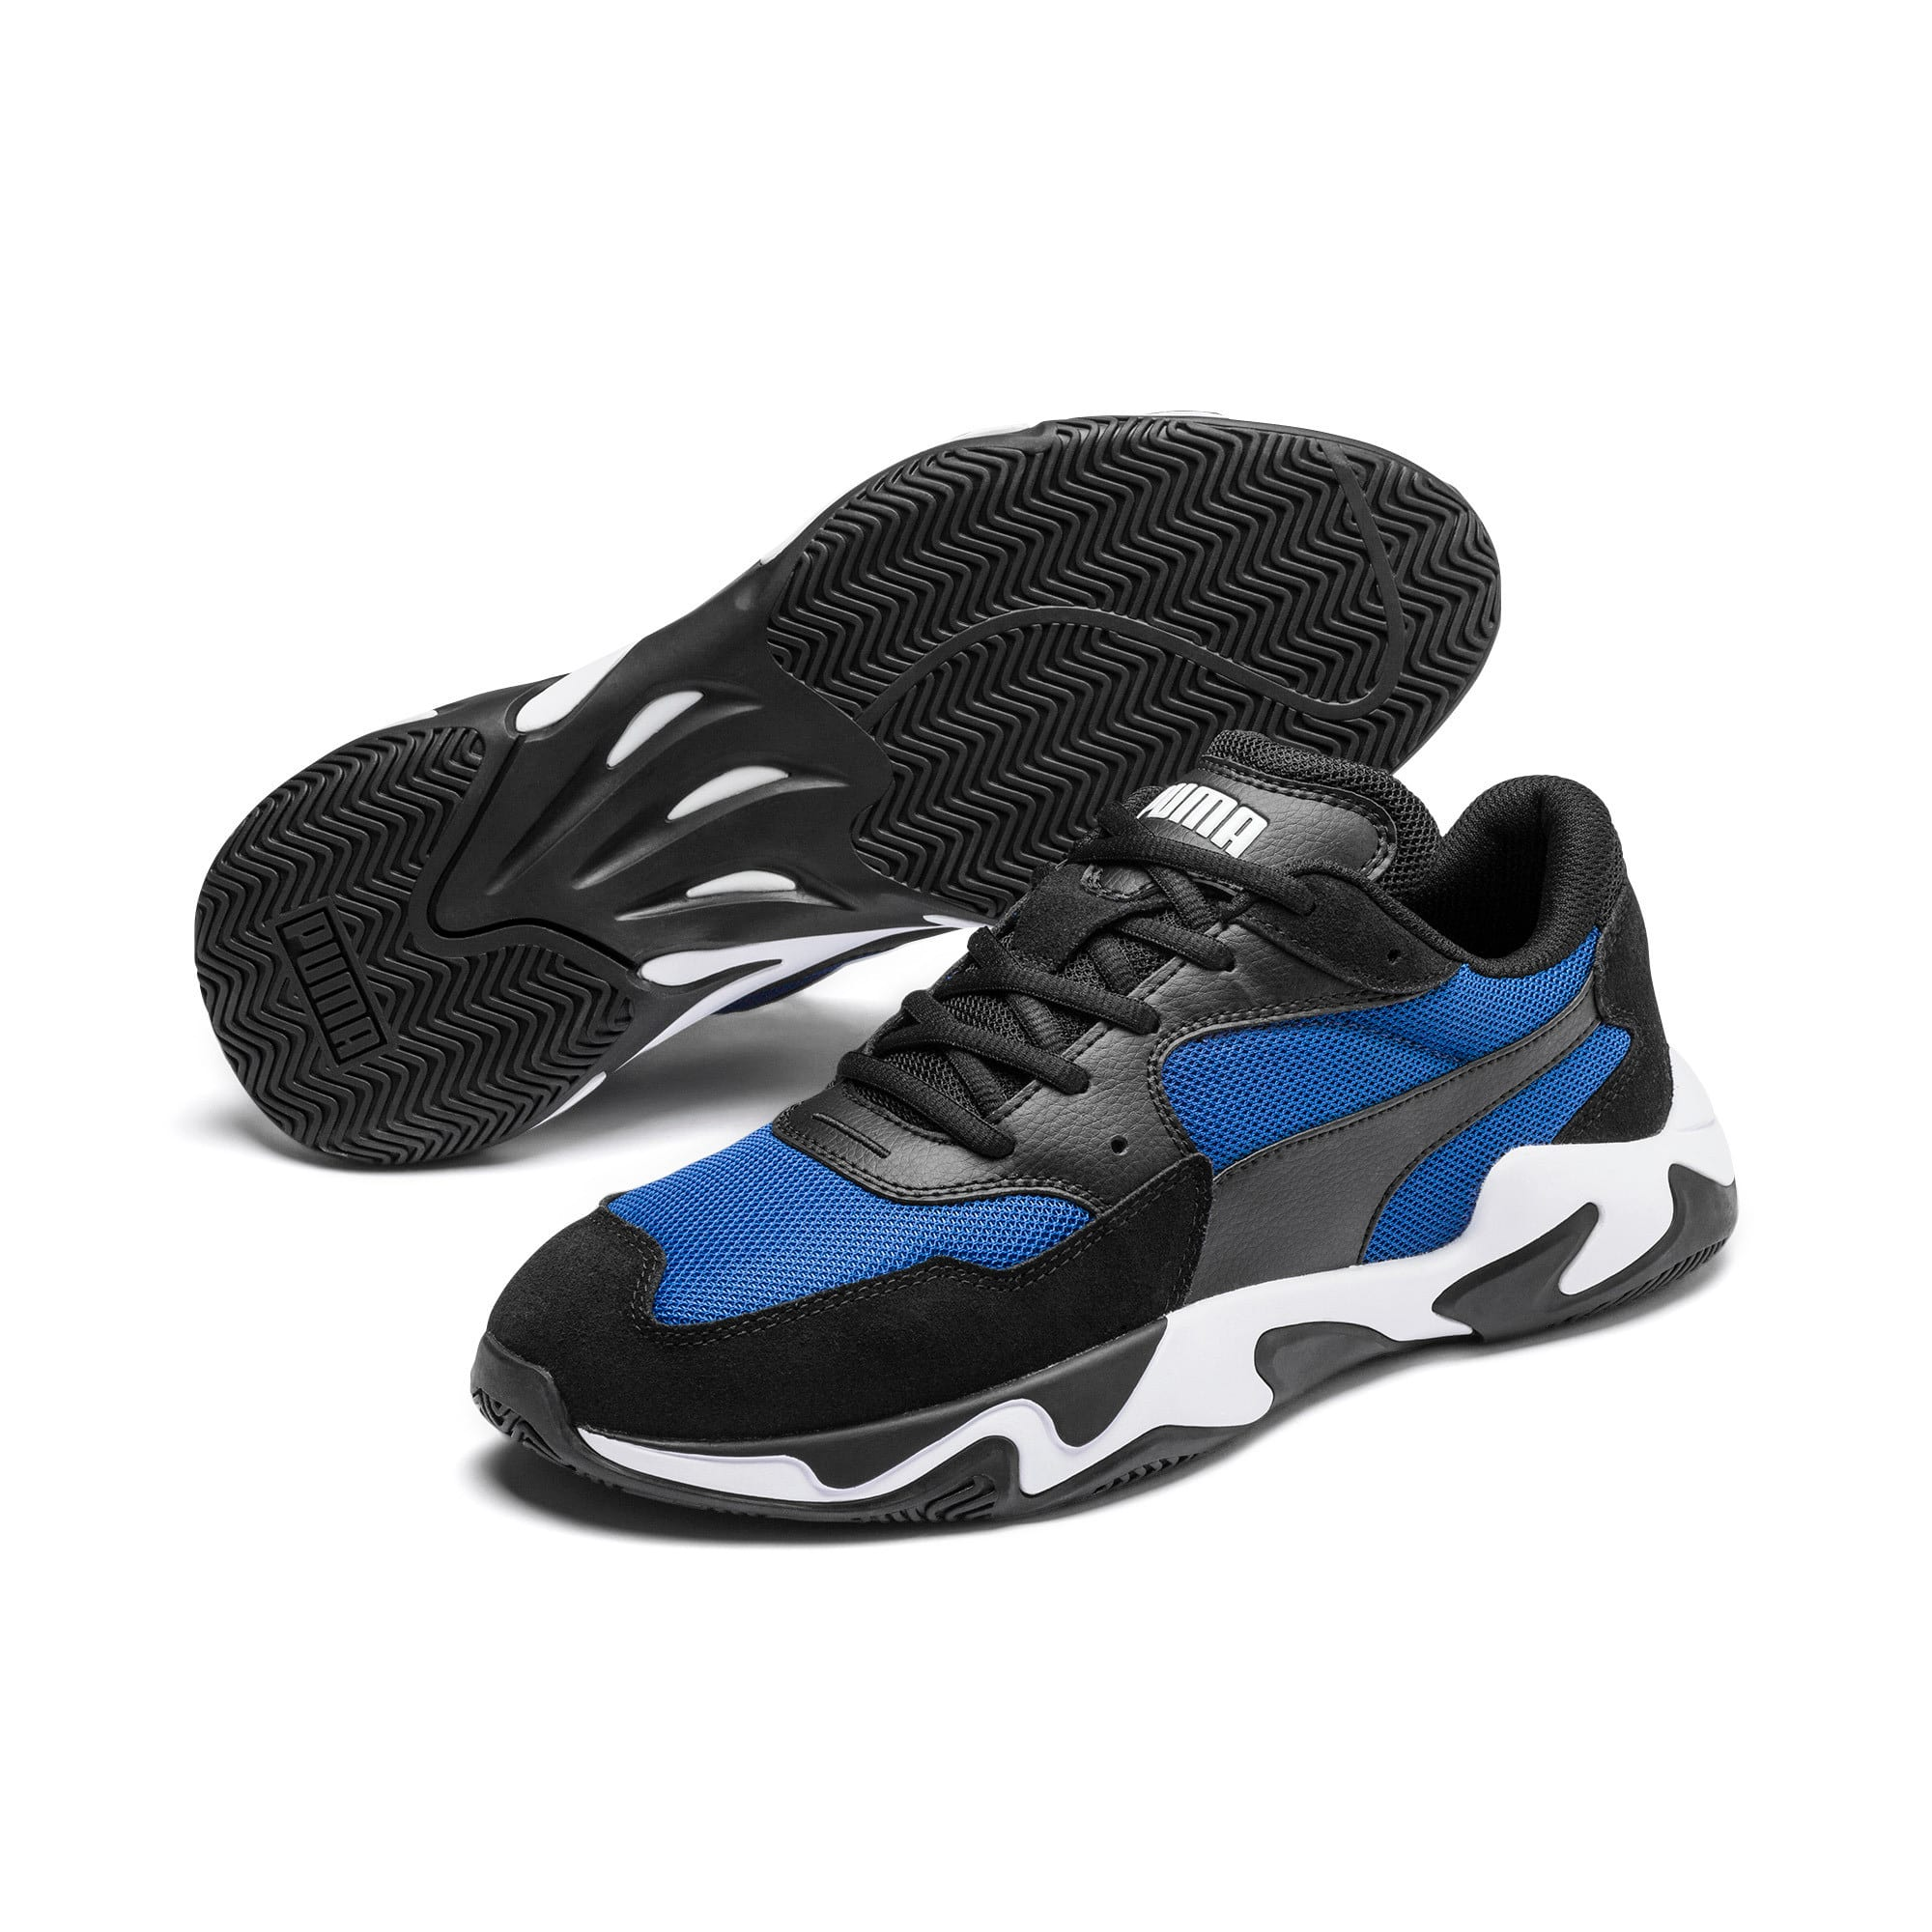 Thumbnail 3 van Storm Adrenaline sportschoenen, Puma Black-Galaxy Blue, medium